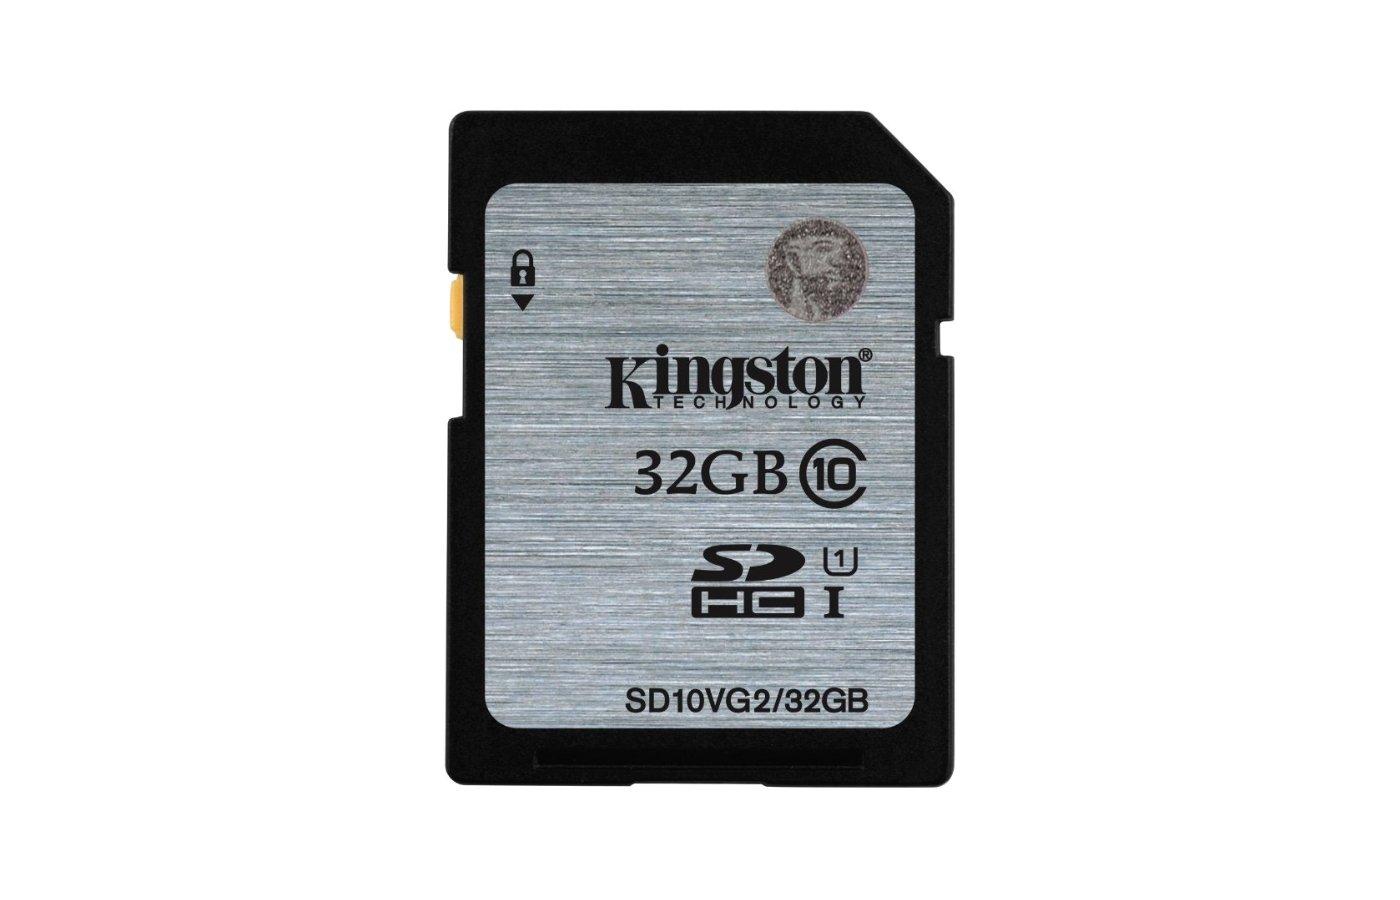 Карта памяти Kingston SDHC 32Gb Class 10 UHS-I 45MB/s (SD10VG2/32GB)